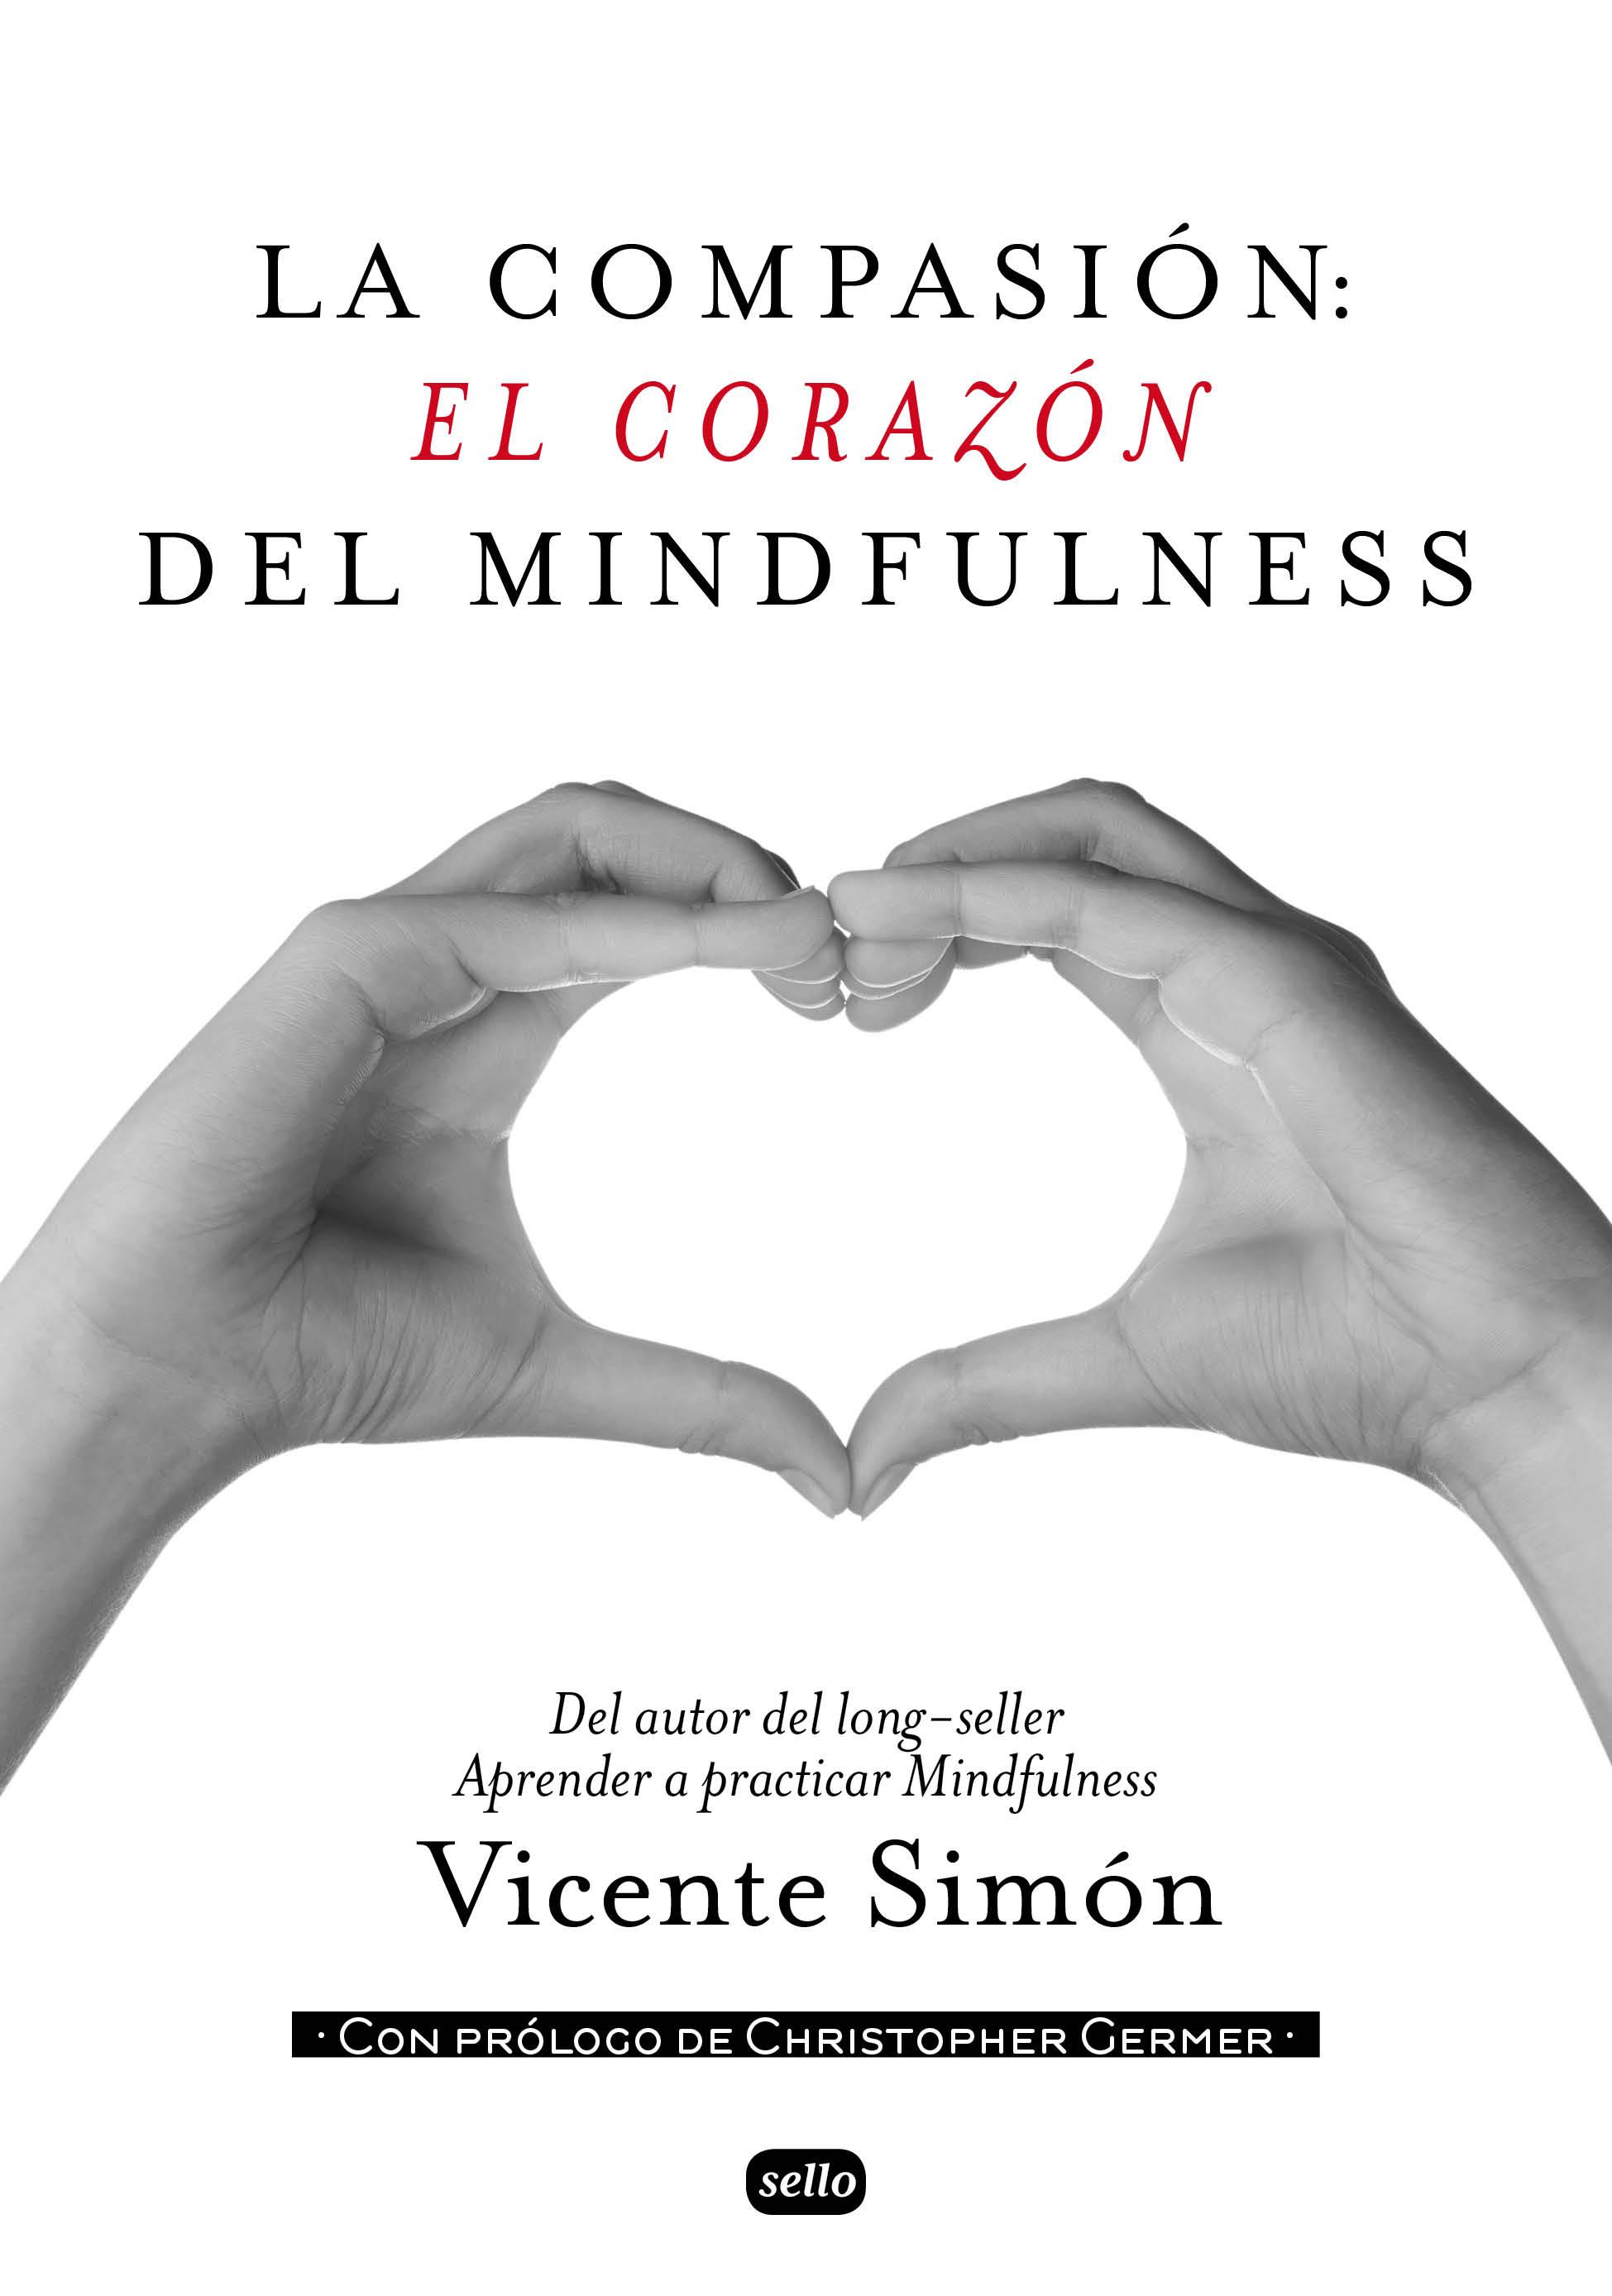 LA COMPASION: EL CORAZON DEL MINDFULNESS